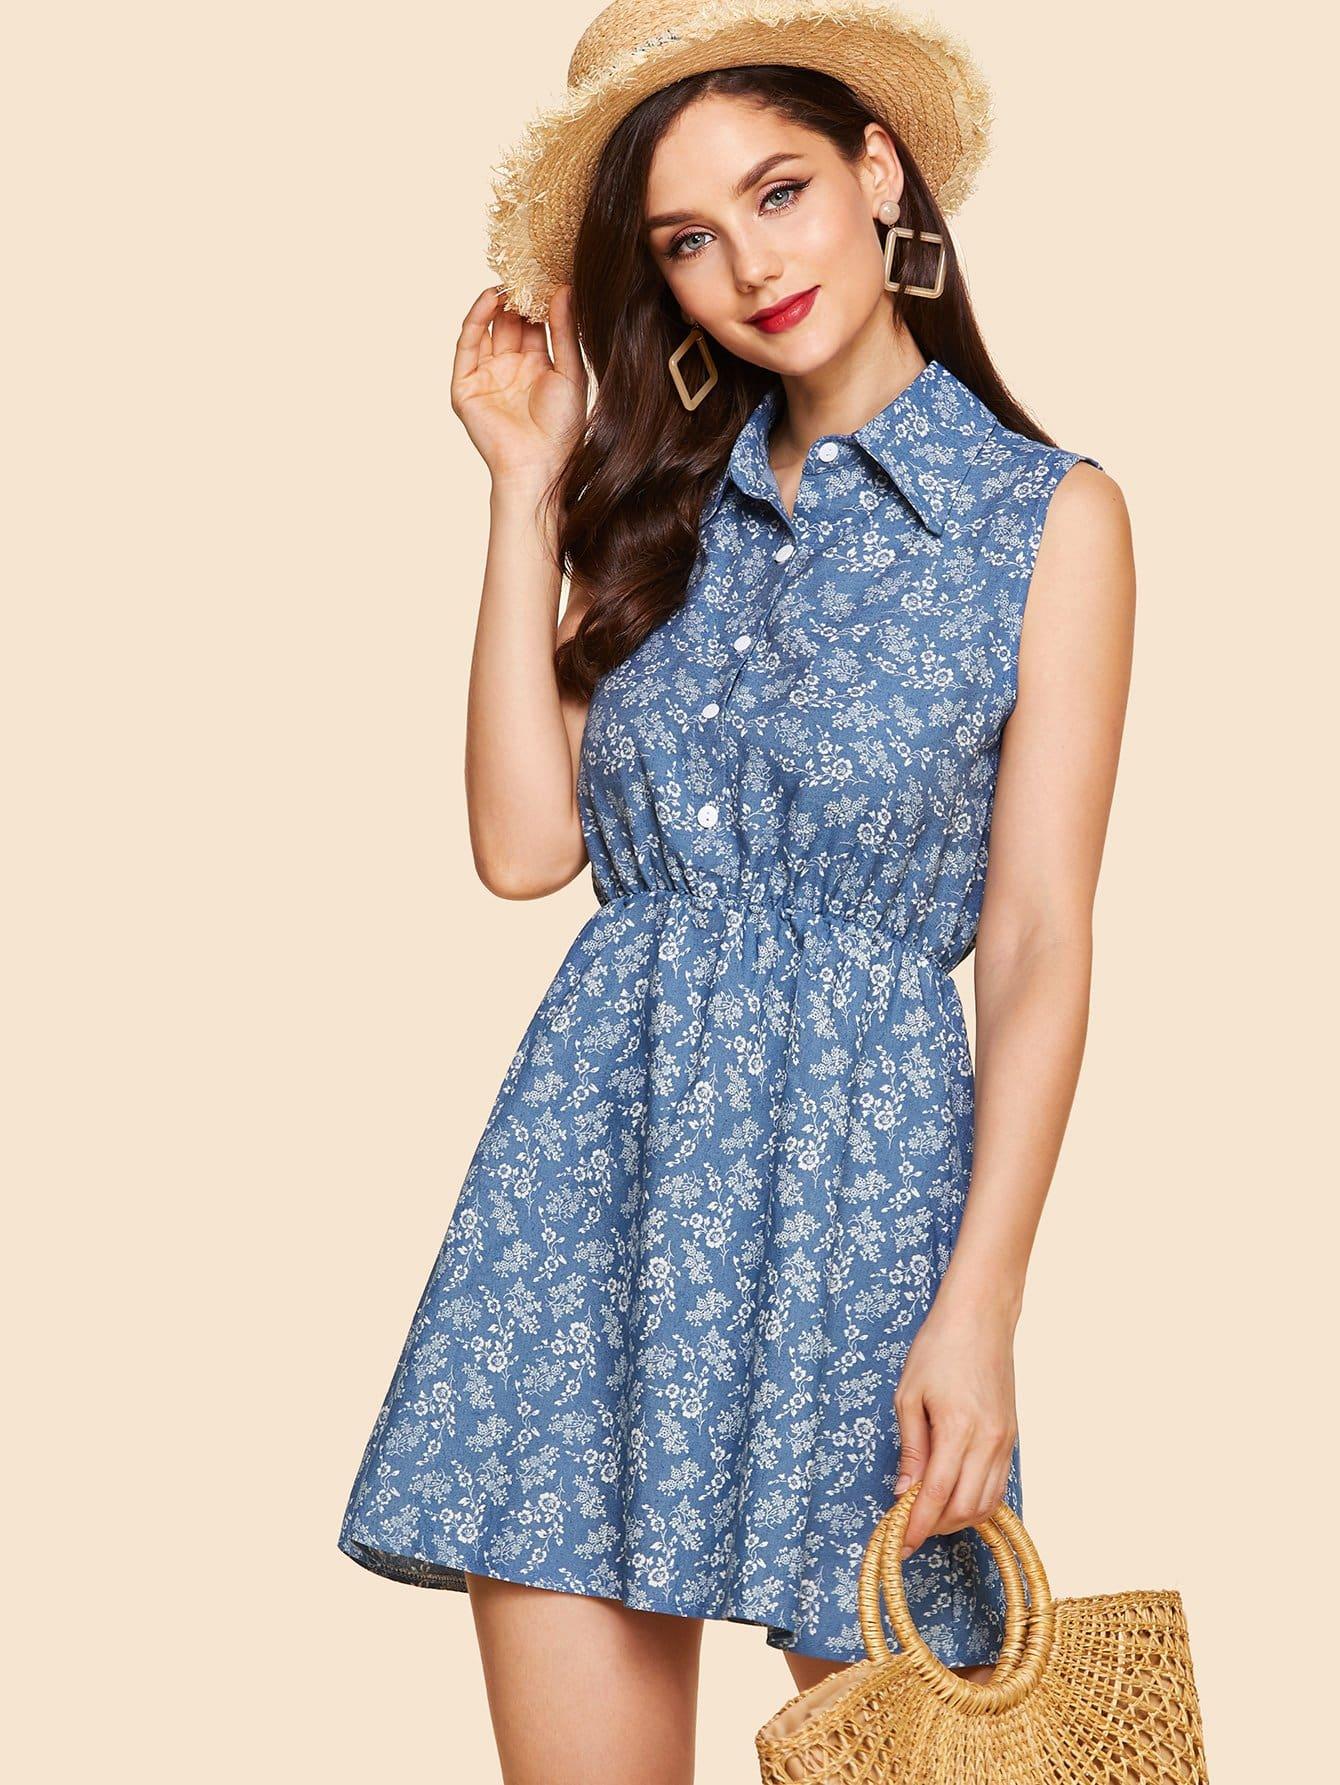 Calico Print Elastic Waist Denim Dress elastic waist button denim dress